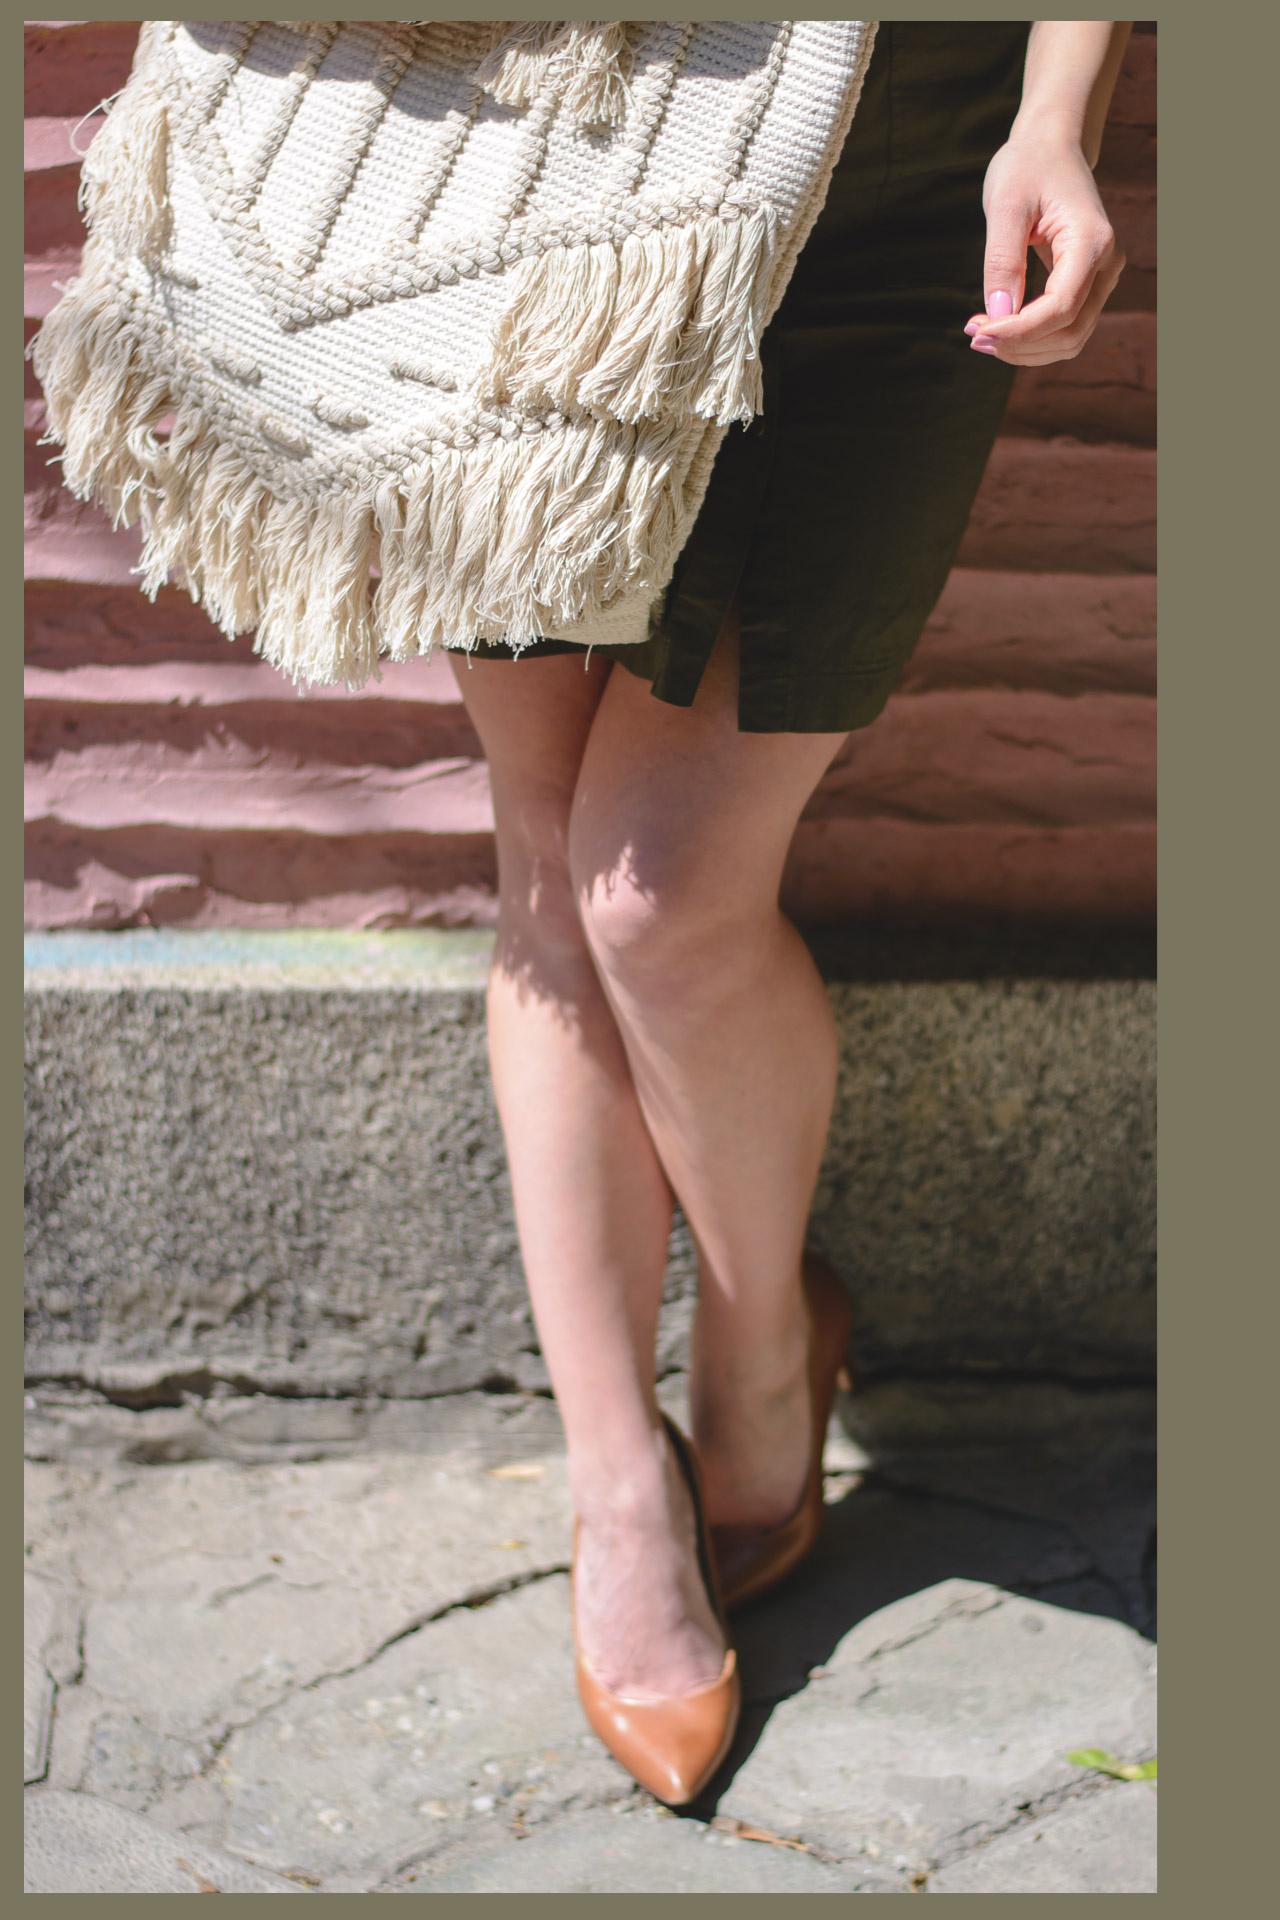 Woven bag sexy high heels